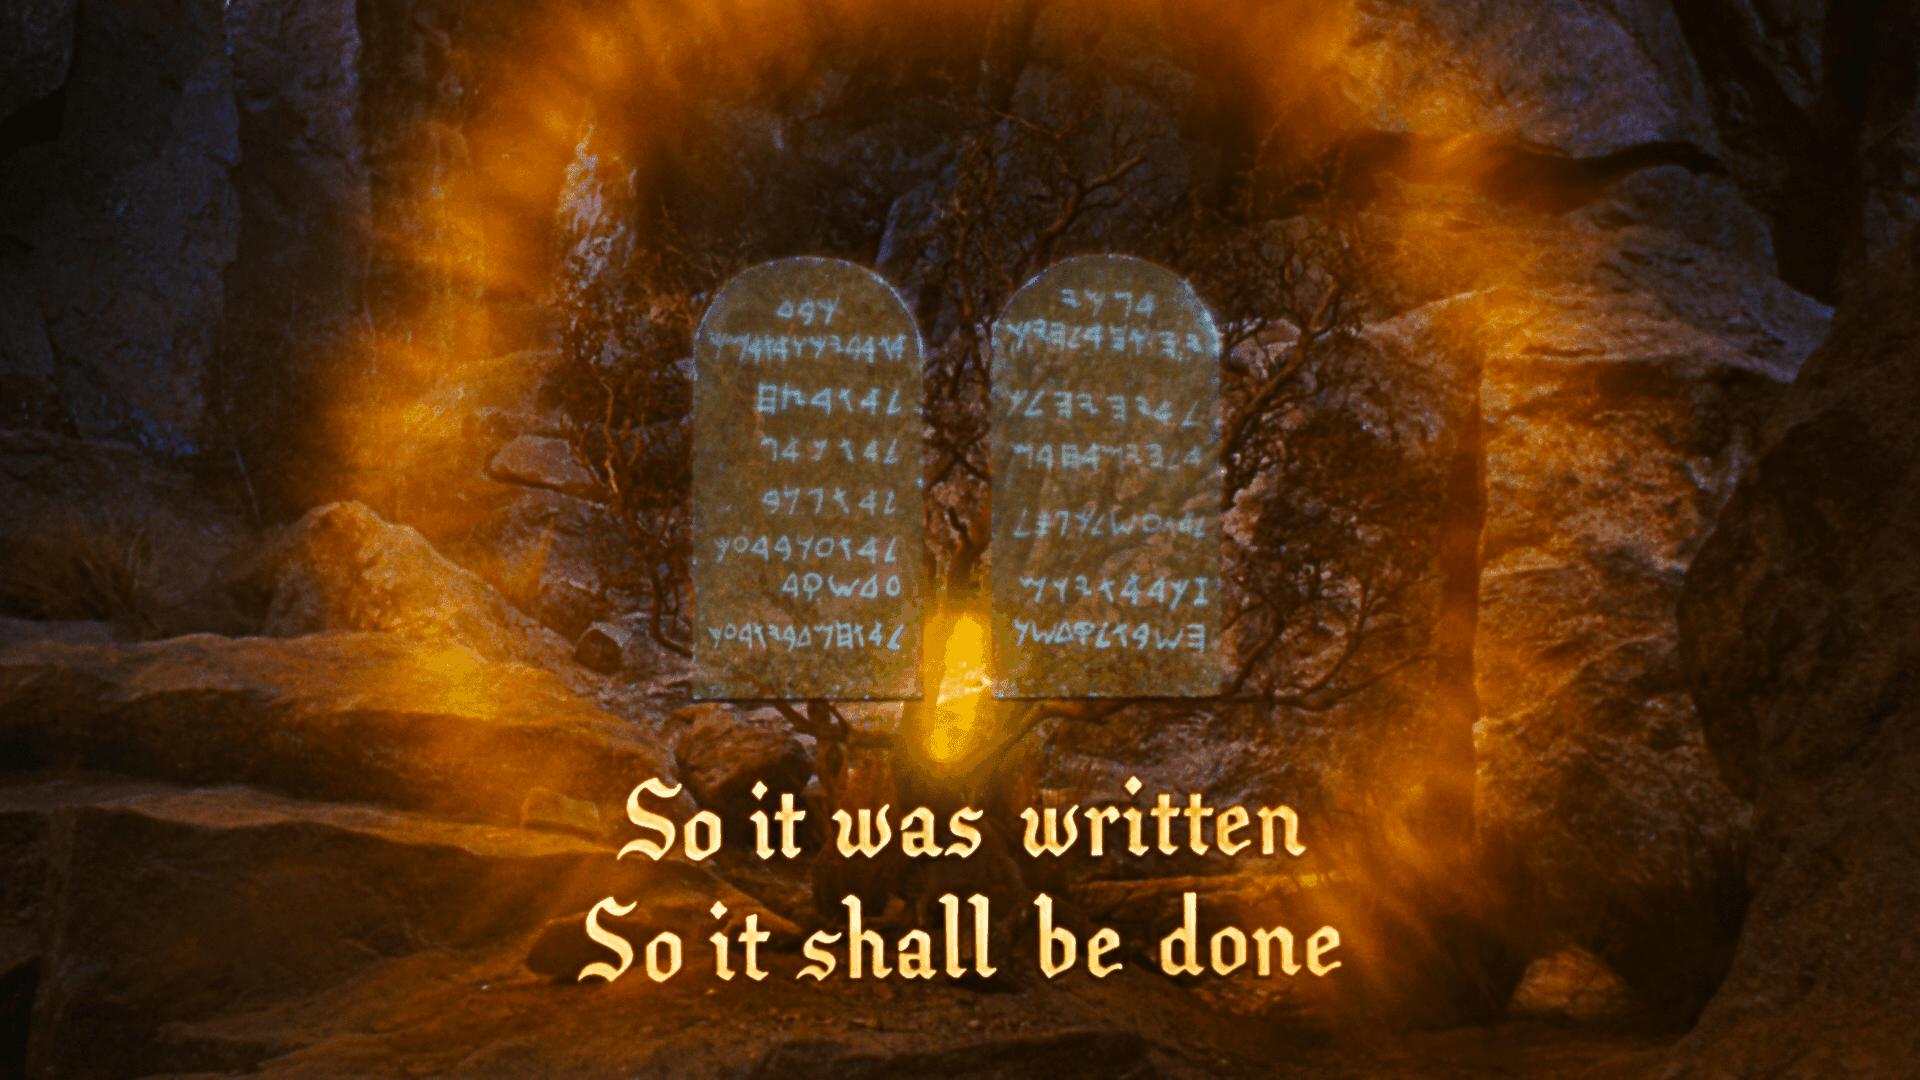 The Ten Commandments floating commandments of biblical law 2020 Blu-ray Paramount.